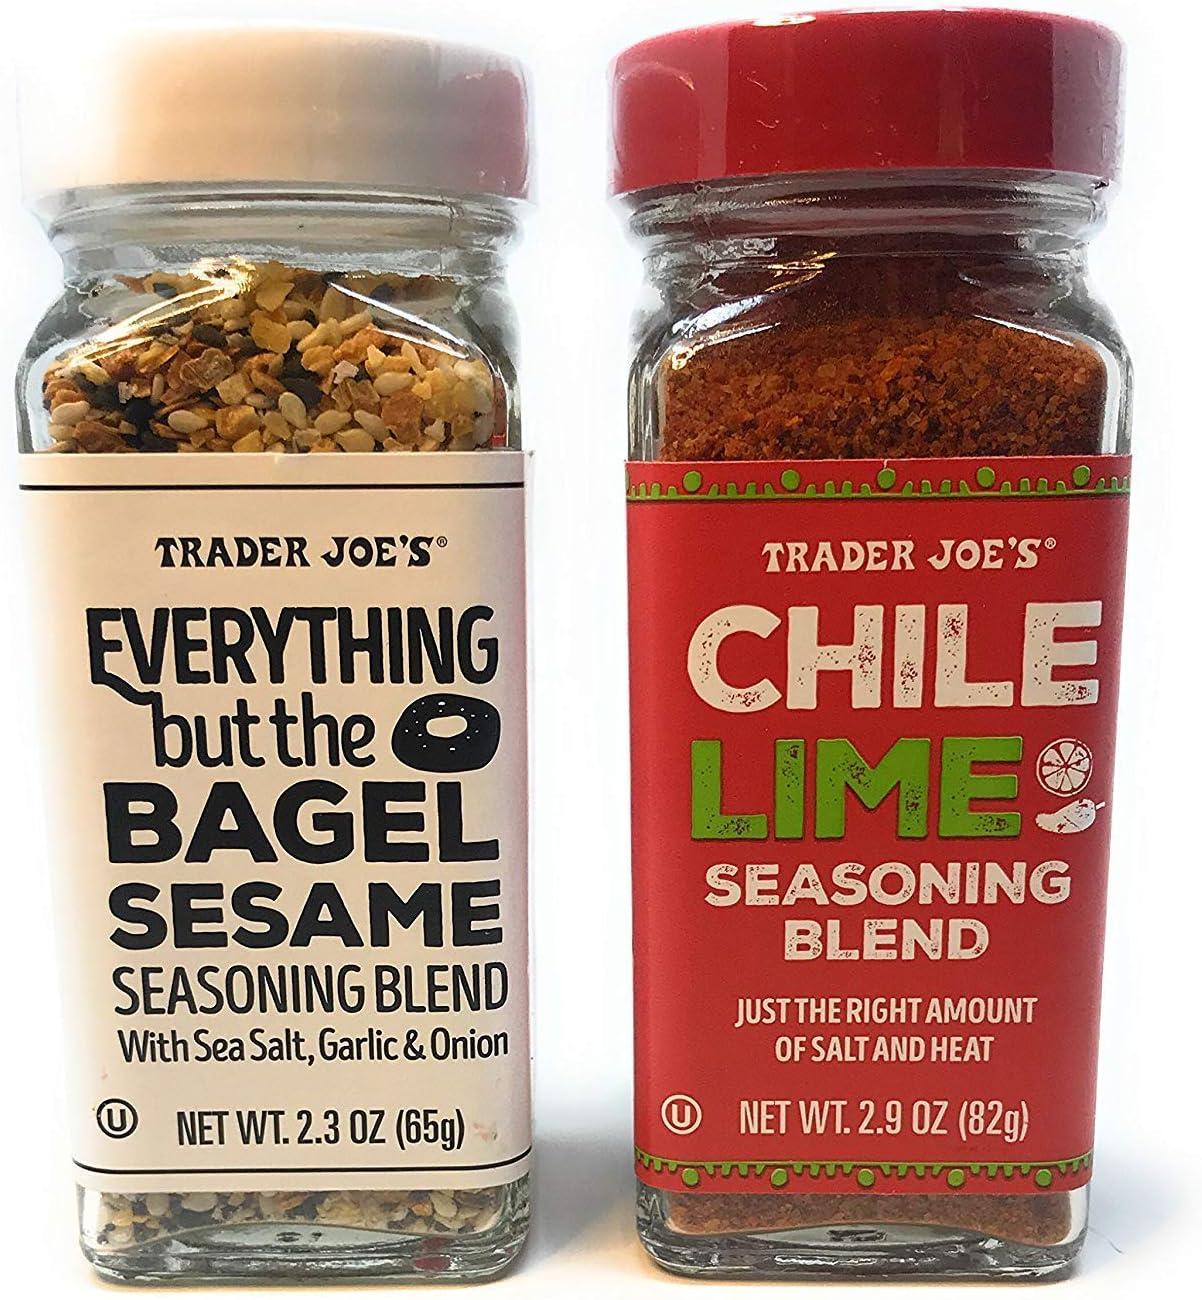 Trader Joe's Seasonings Bundle - Everything But The Bagel Sesame and Chile Lime Seasoning Blends (1 of each)